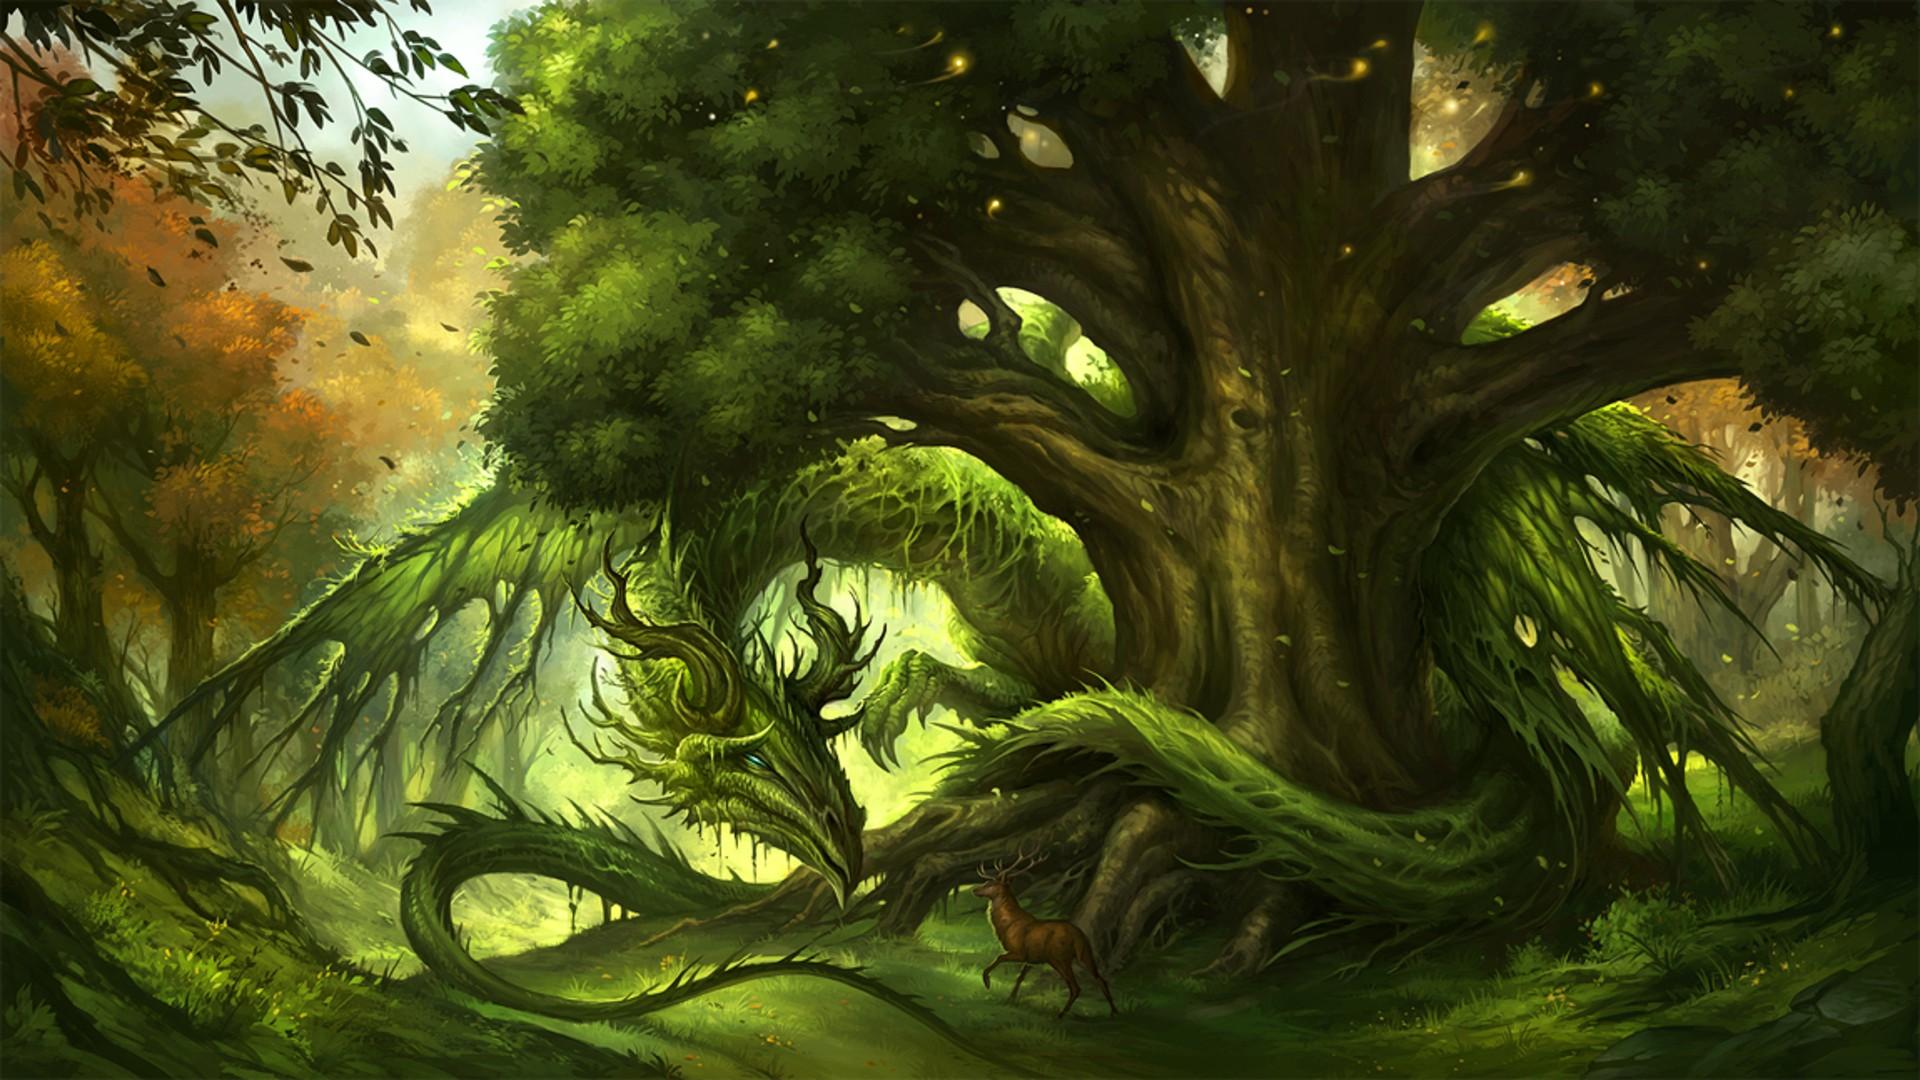 фэнтези лес рисунок узнаете